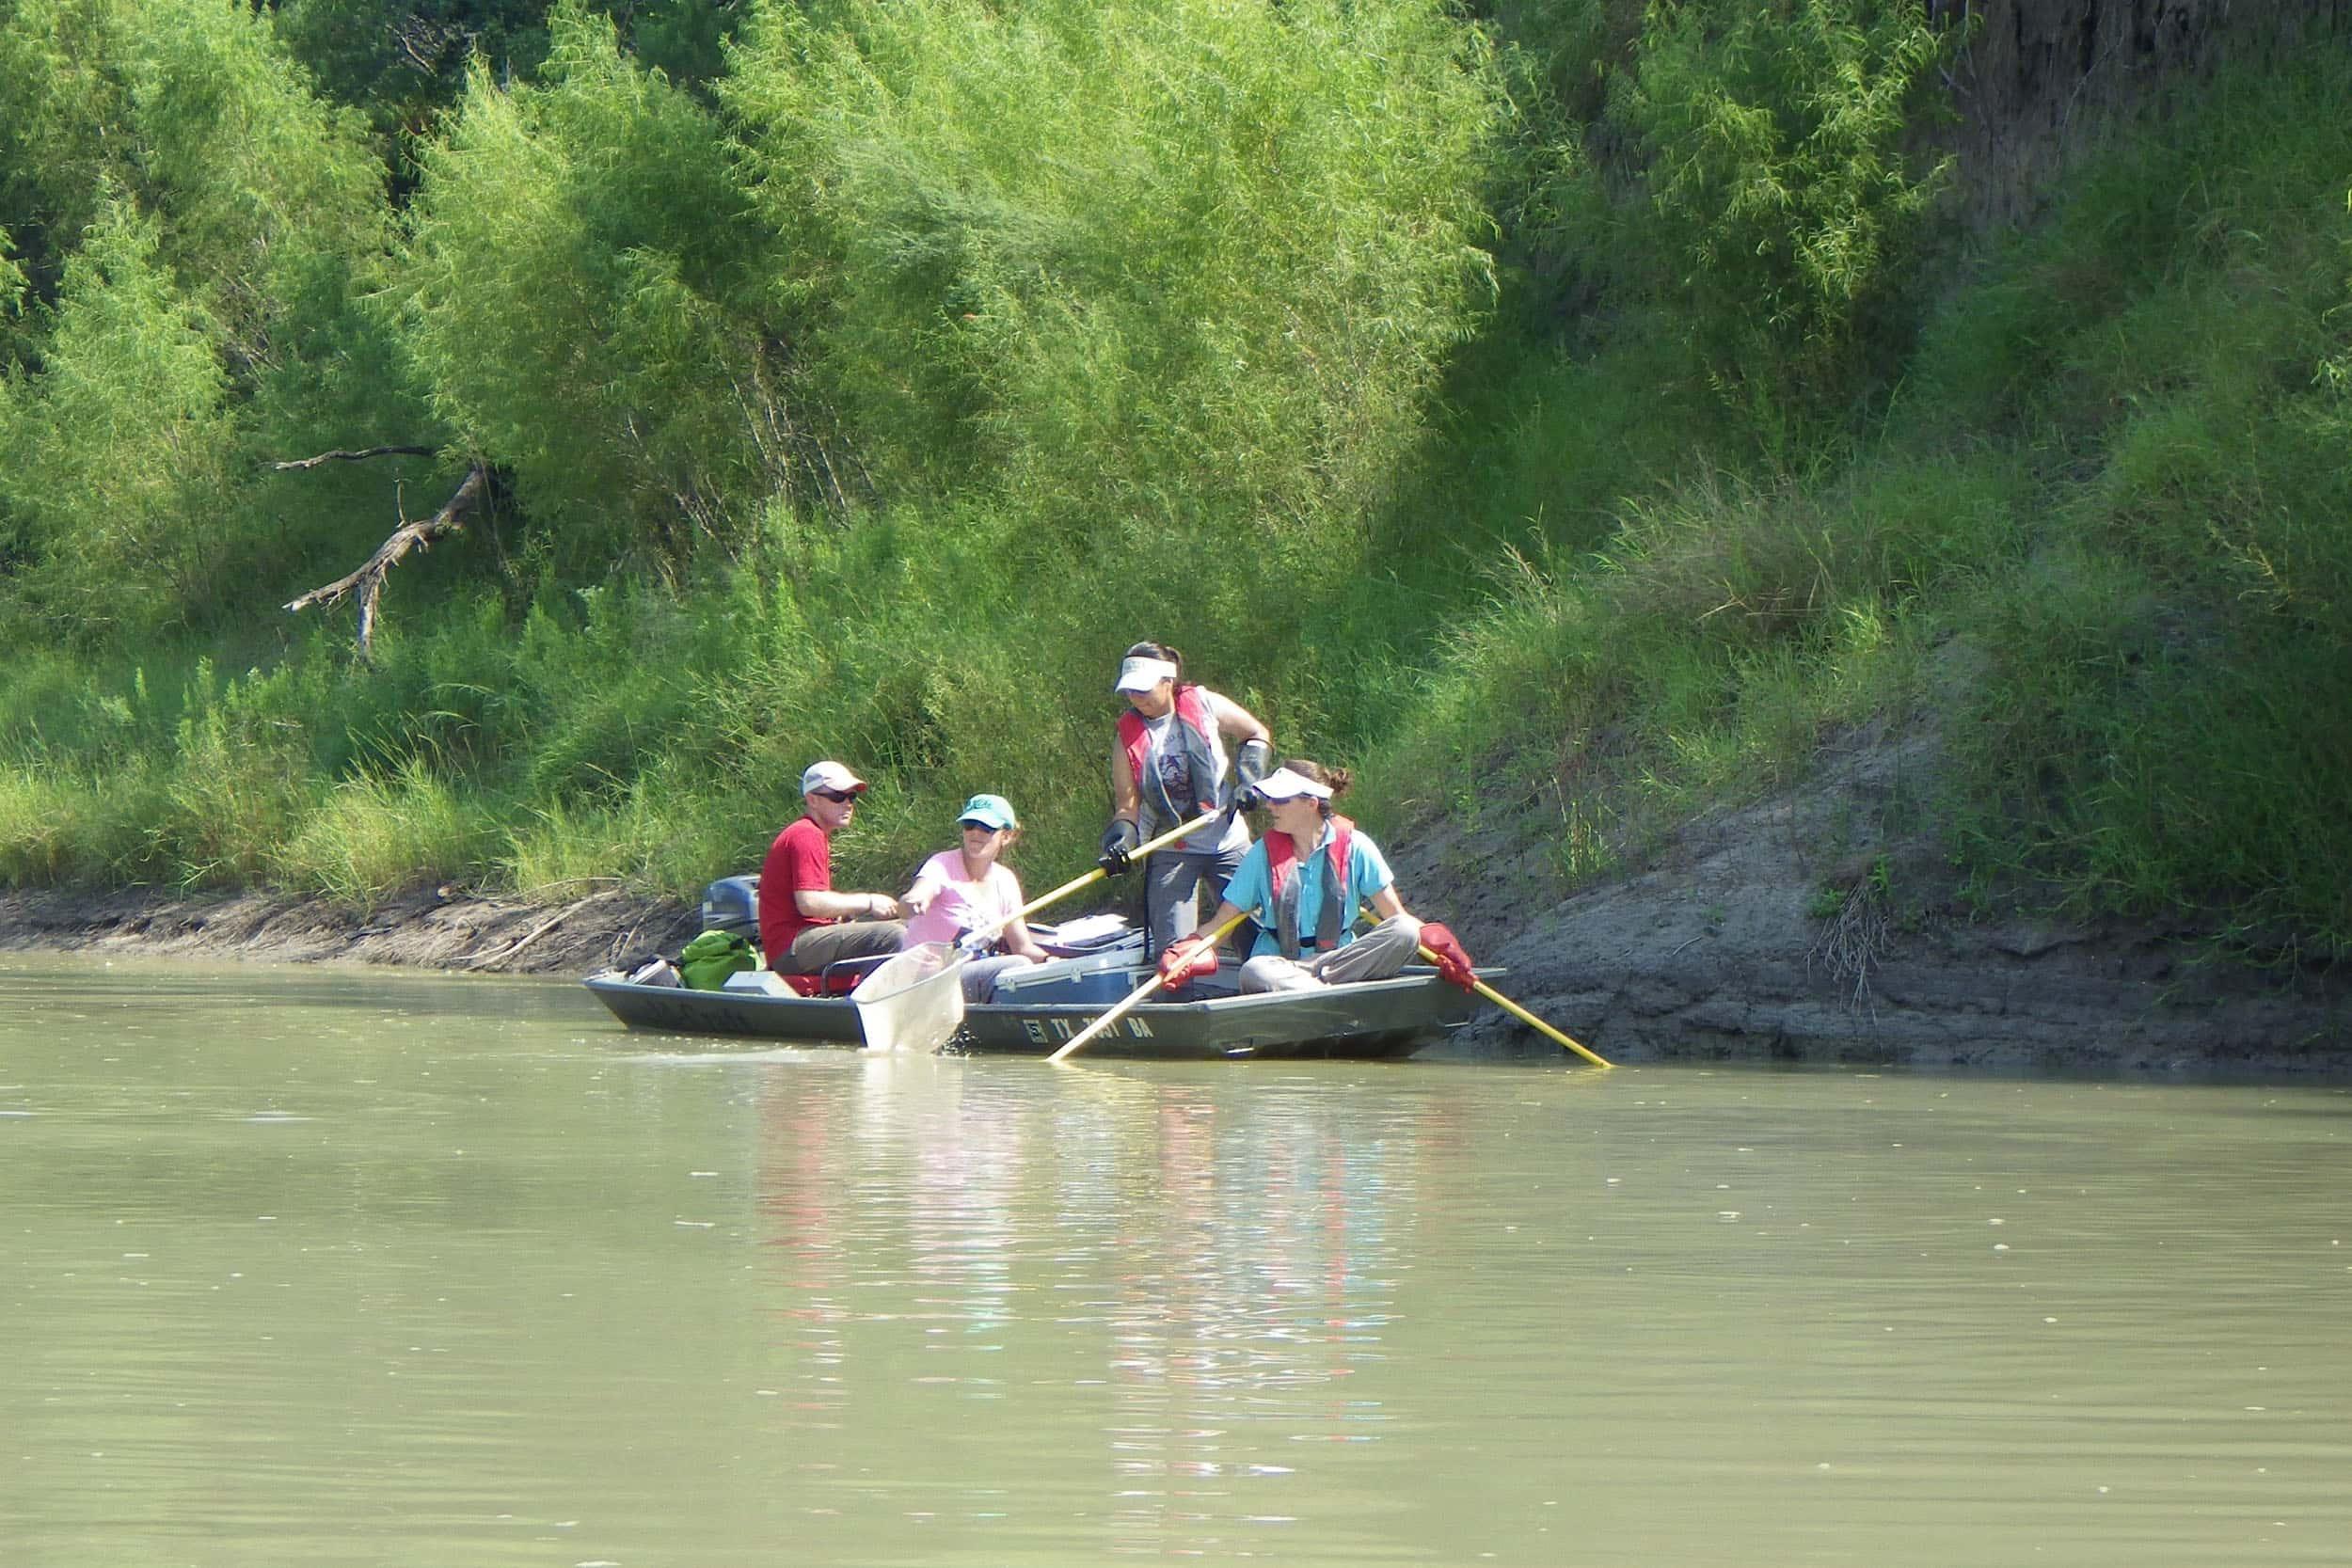 EIH NRSA crew electroshocking on the Nueces River